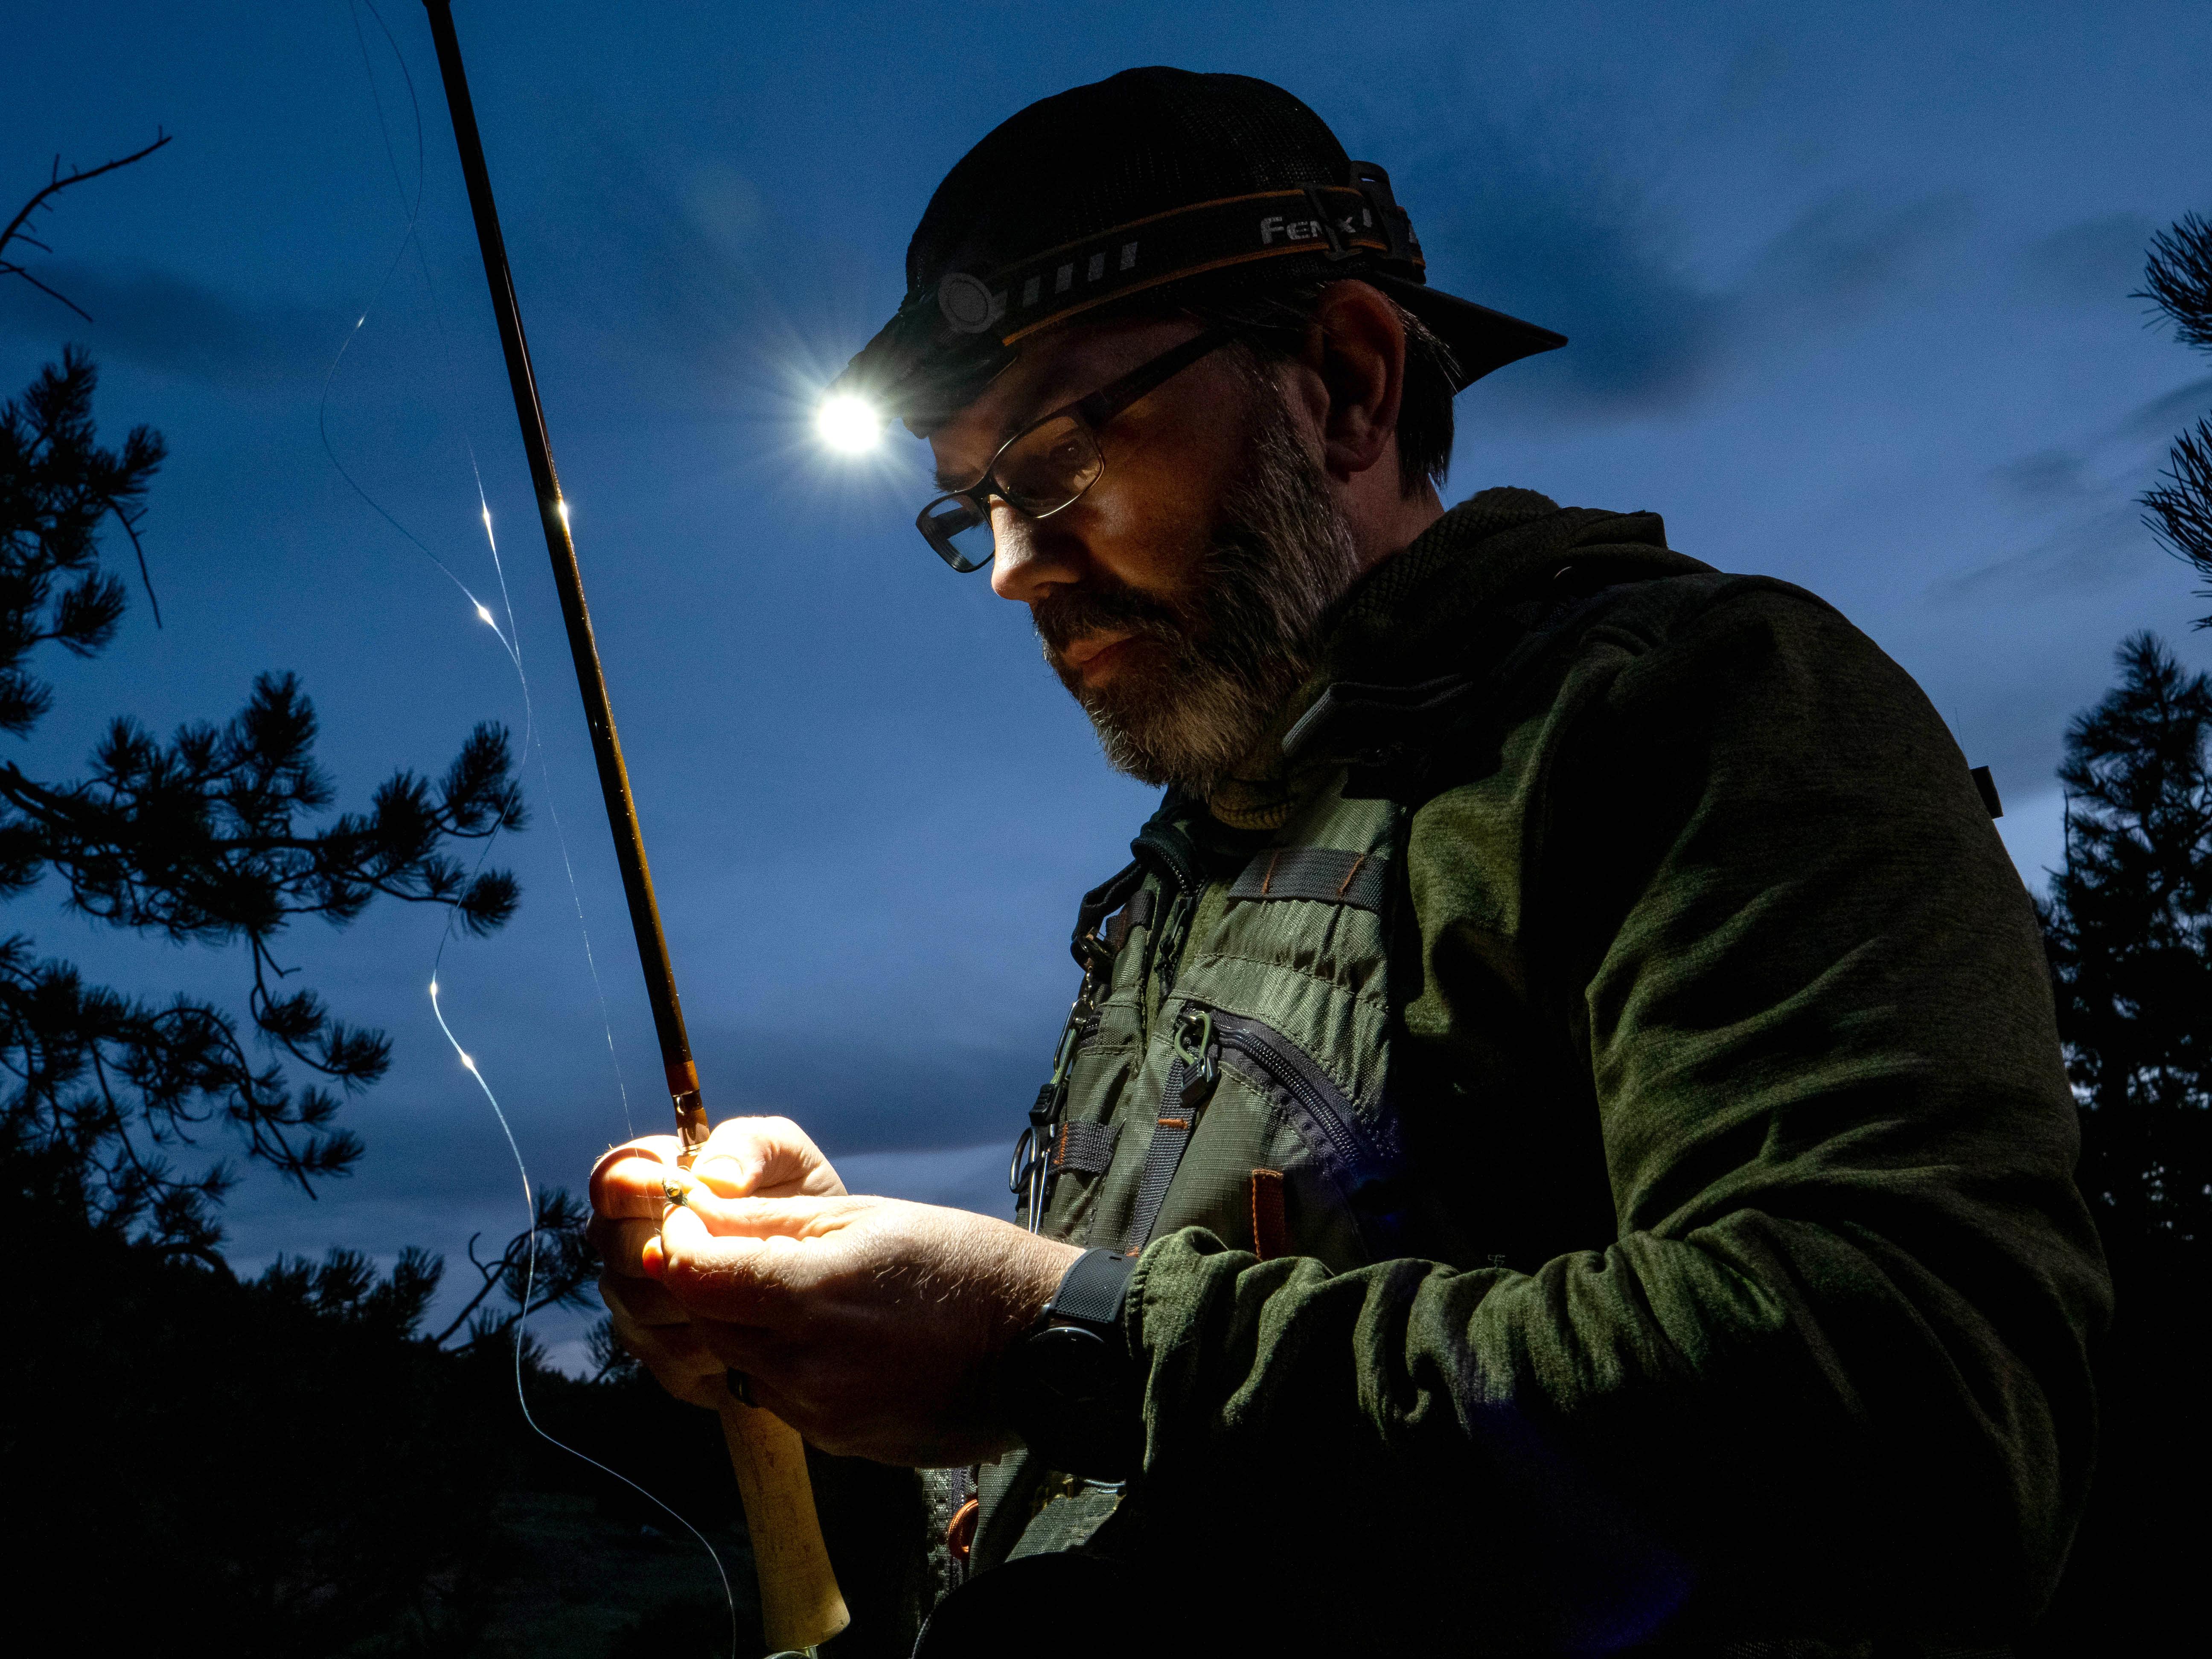 Man Tying Fly Wearing Fenix Headlamp Fly Fishing